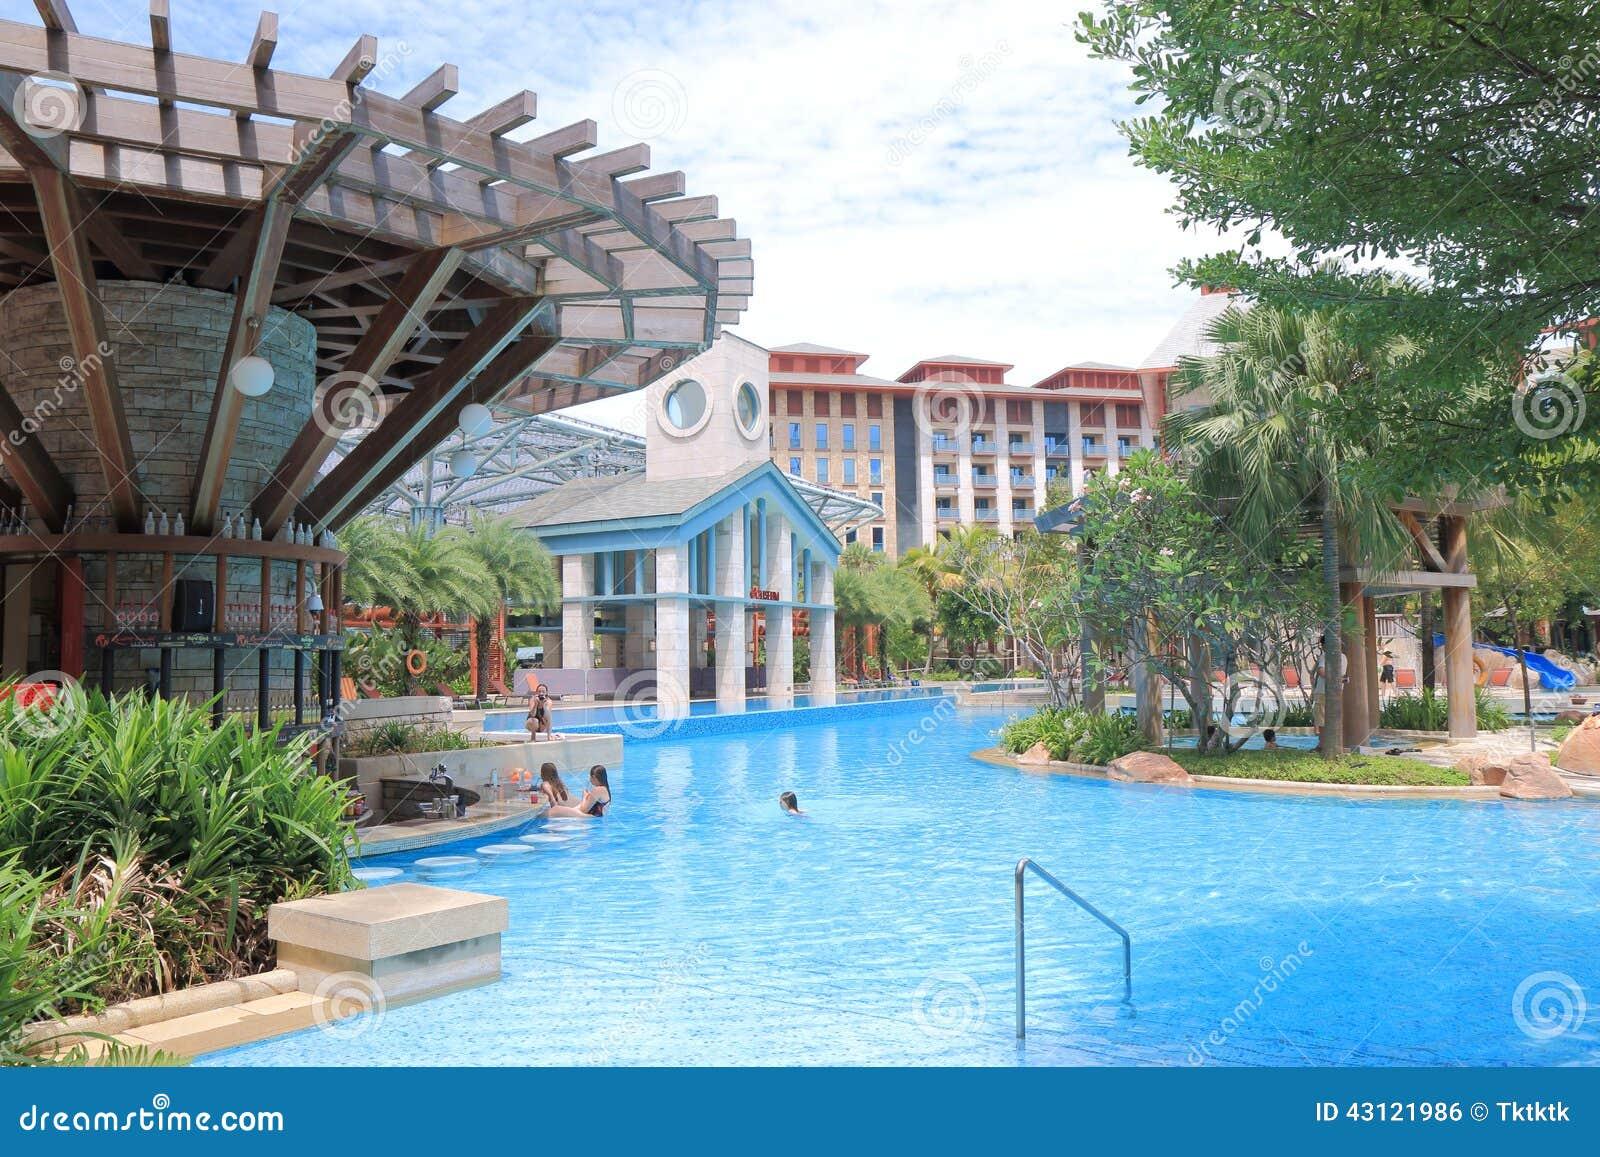 hard rock hotel sentosa singapore editorial photo - image: 43121986